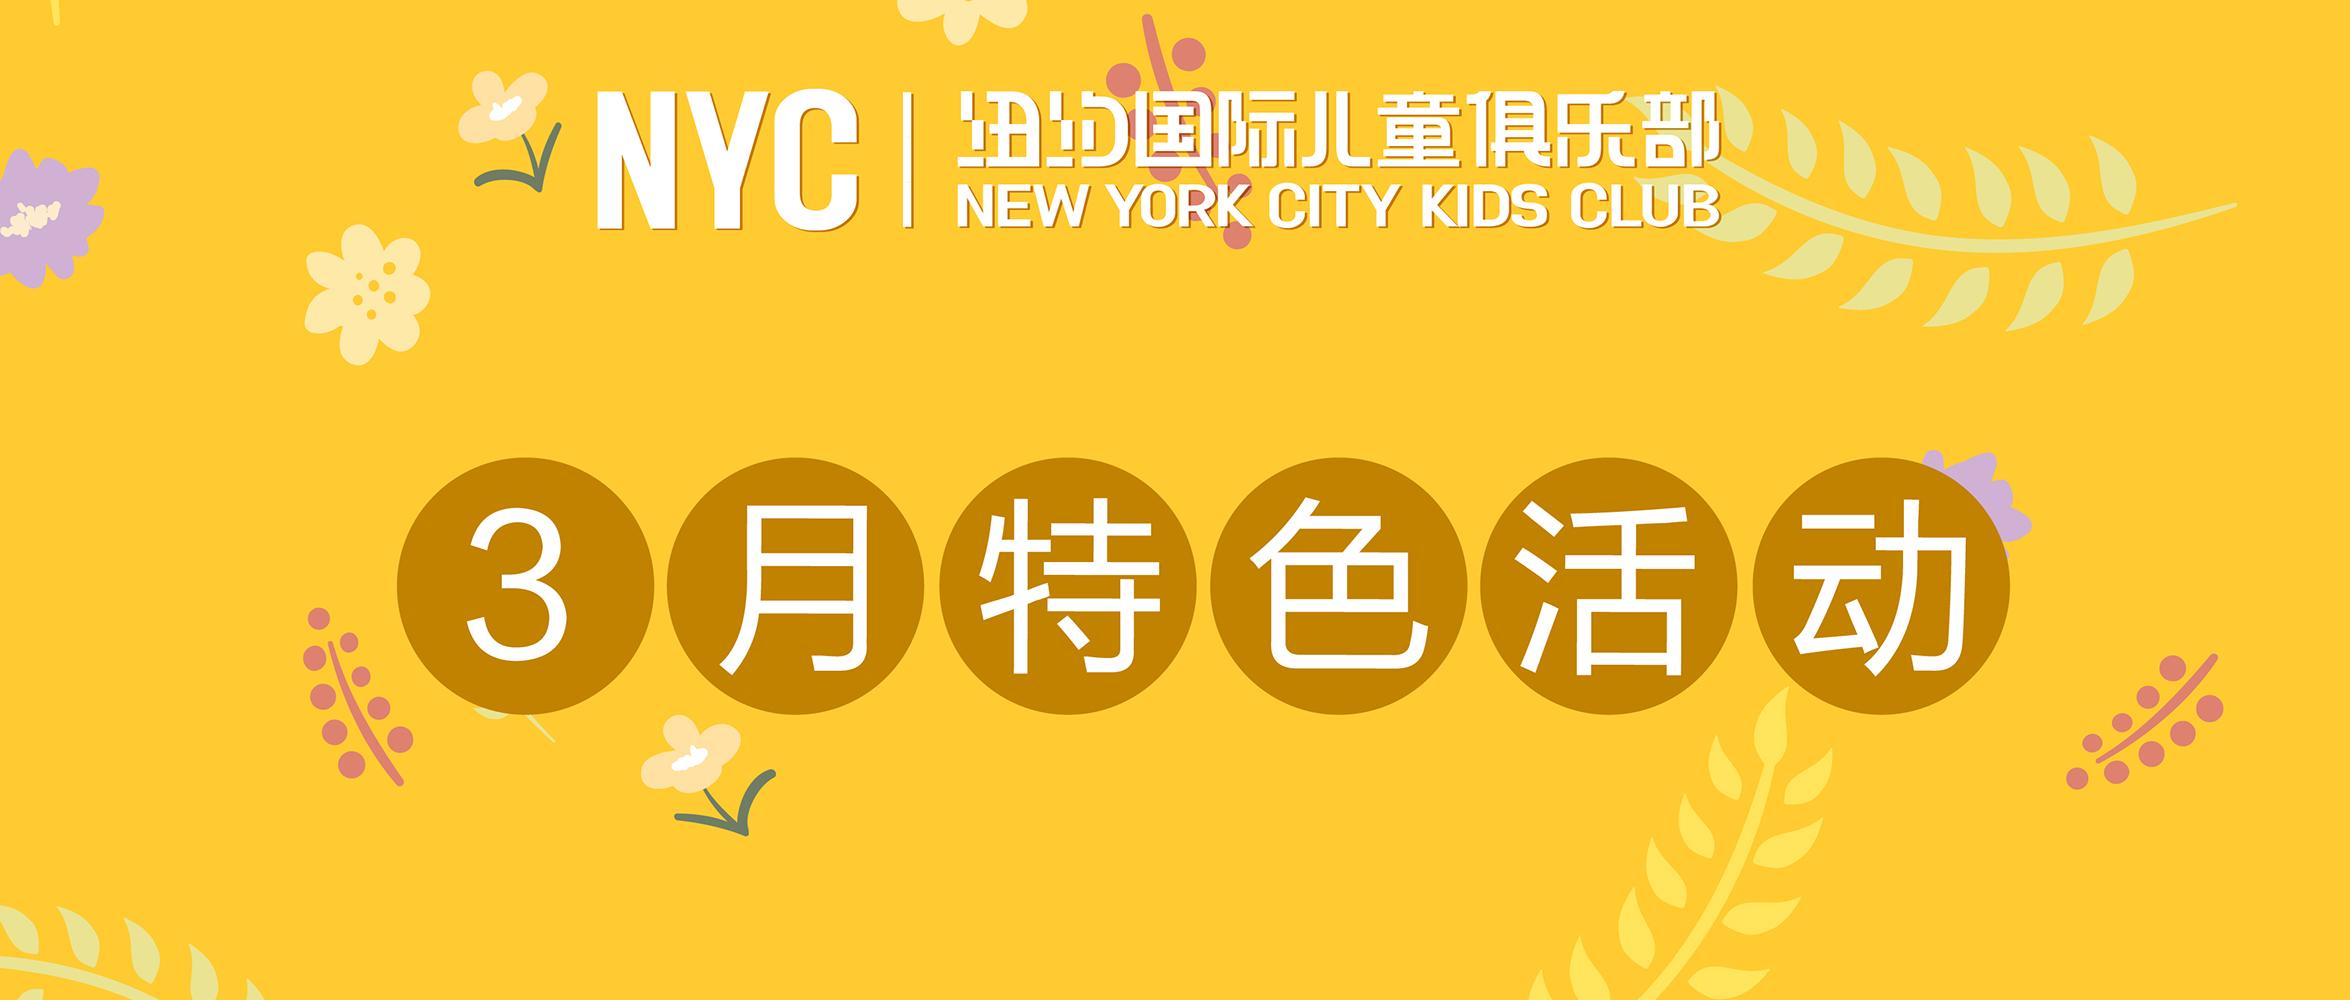 NYC纽约国际天津早教中心:三月活动预告